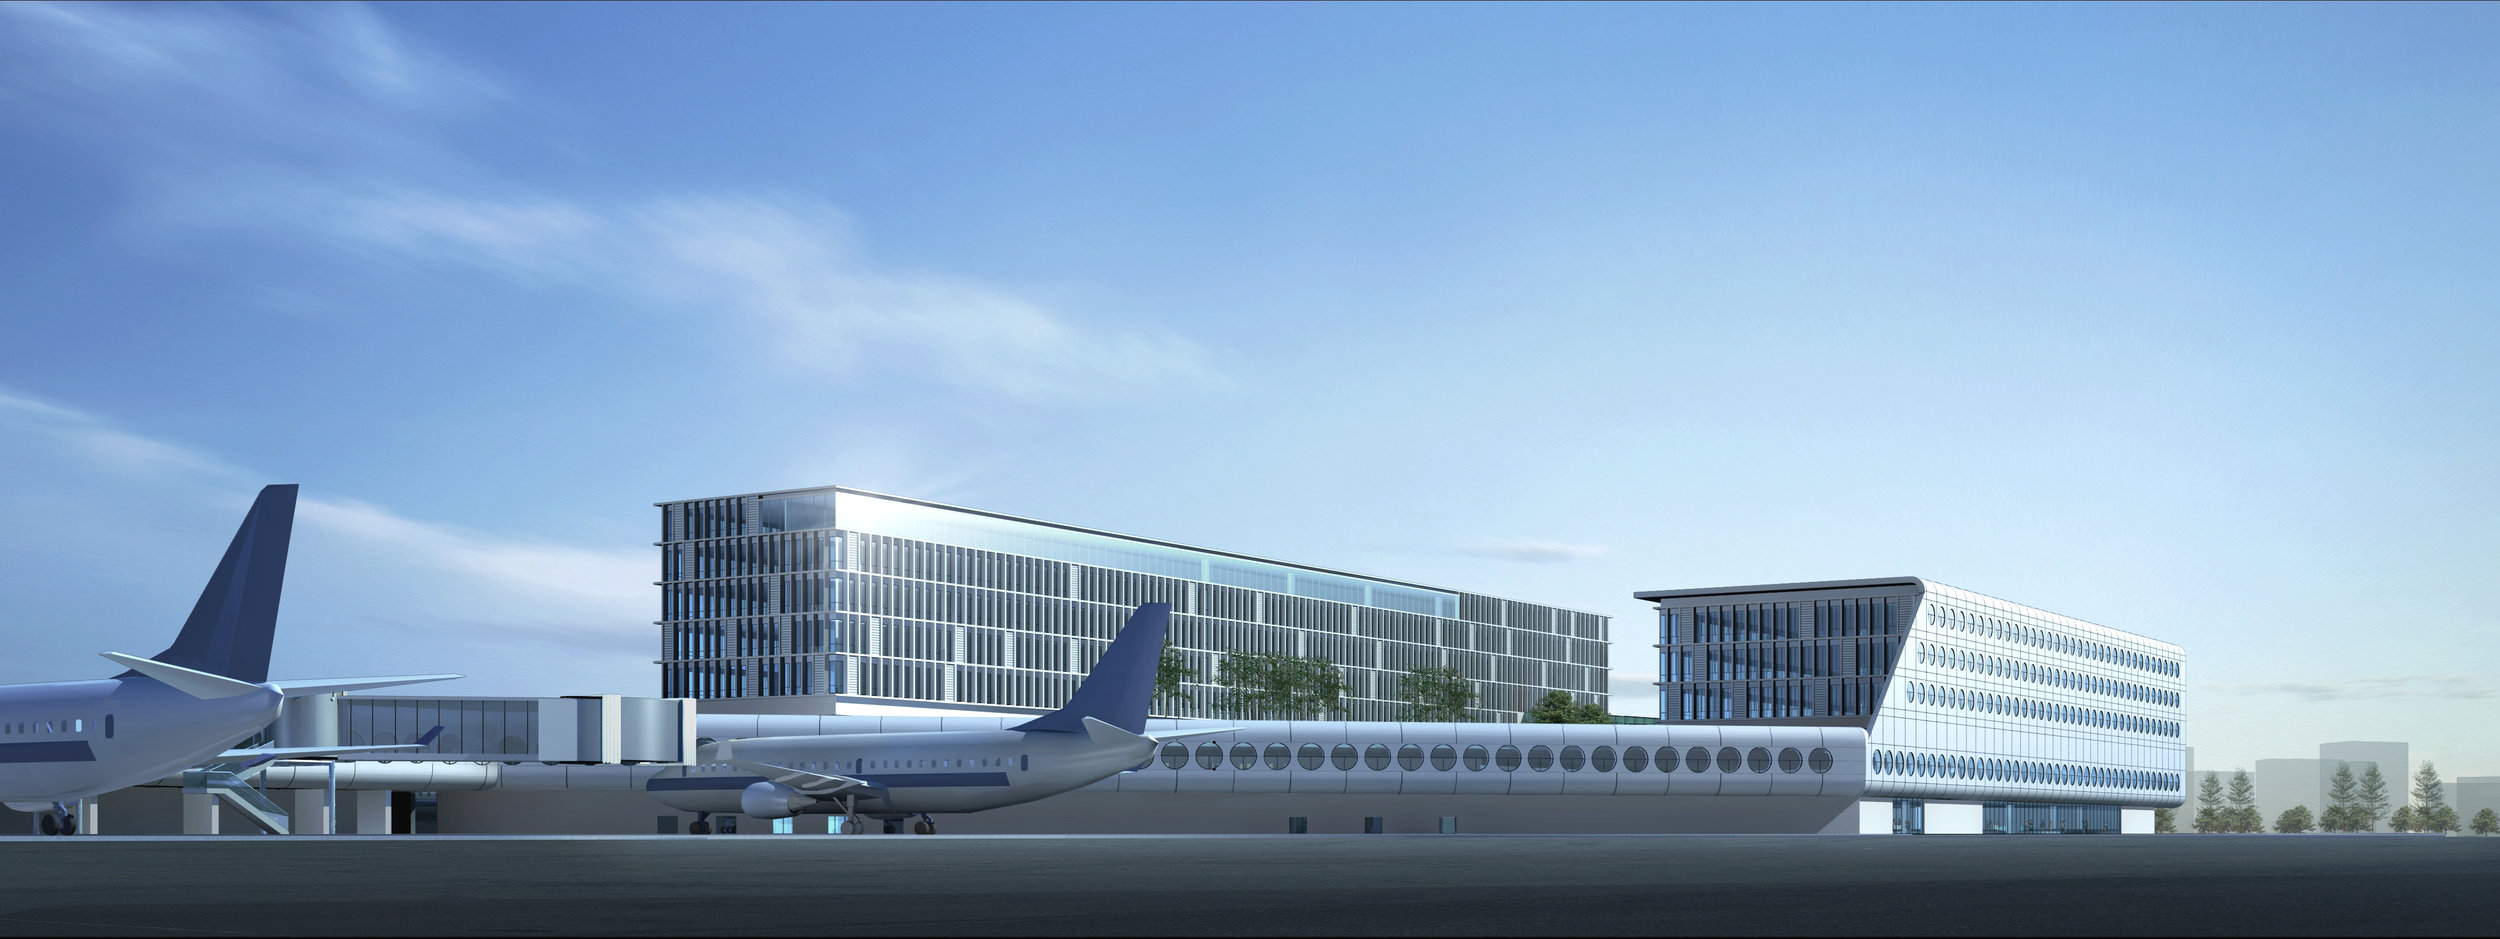 Gaoqi Int'l Airport<br>高崎國際機場